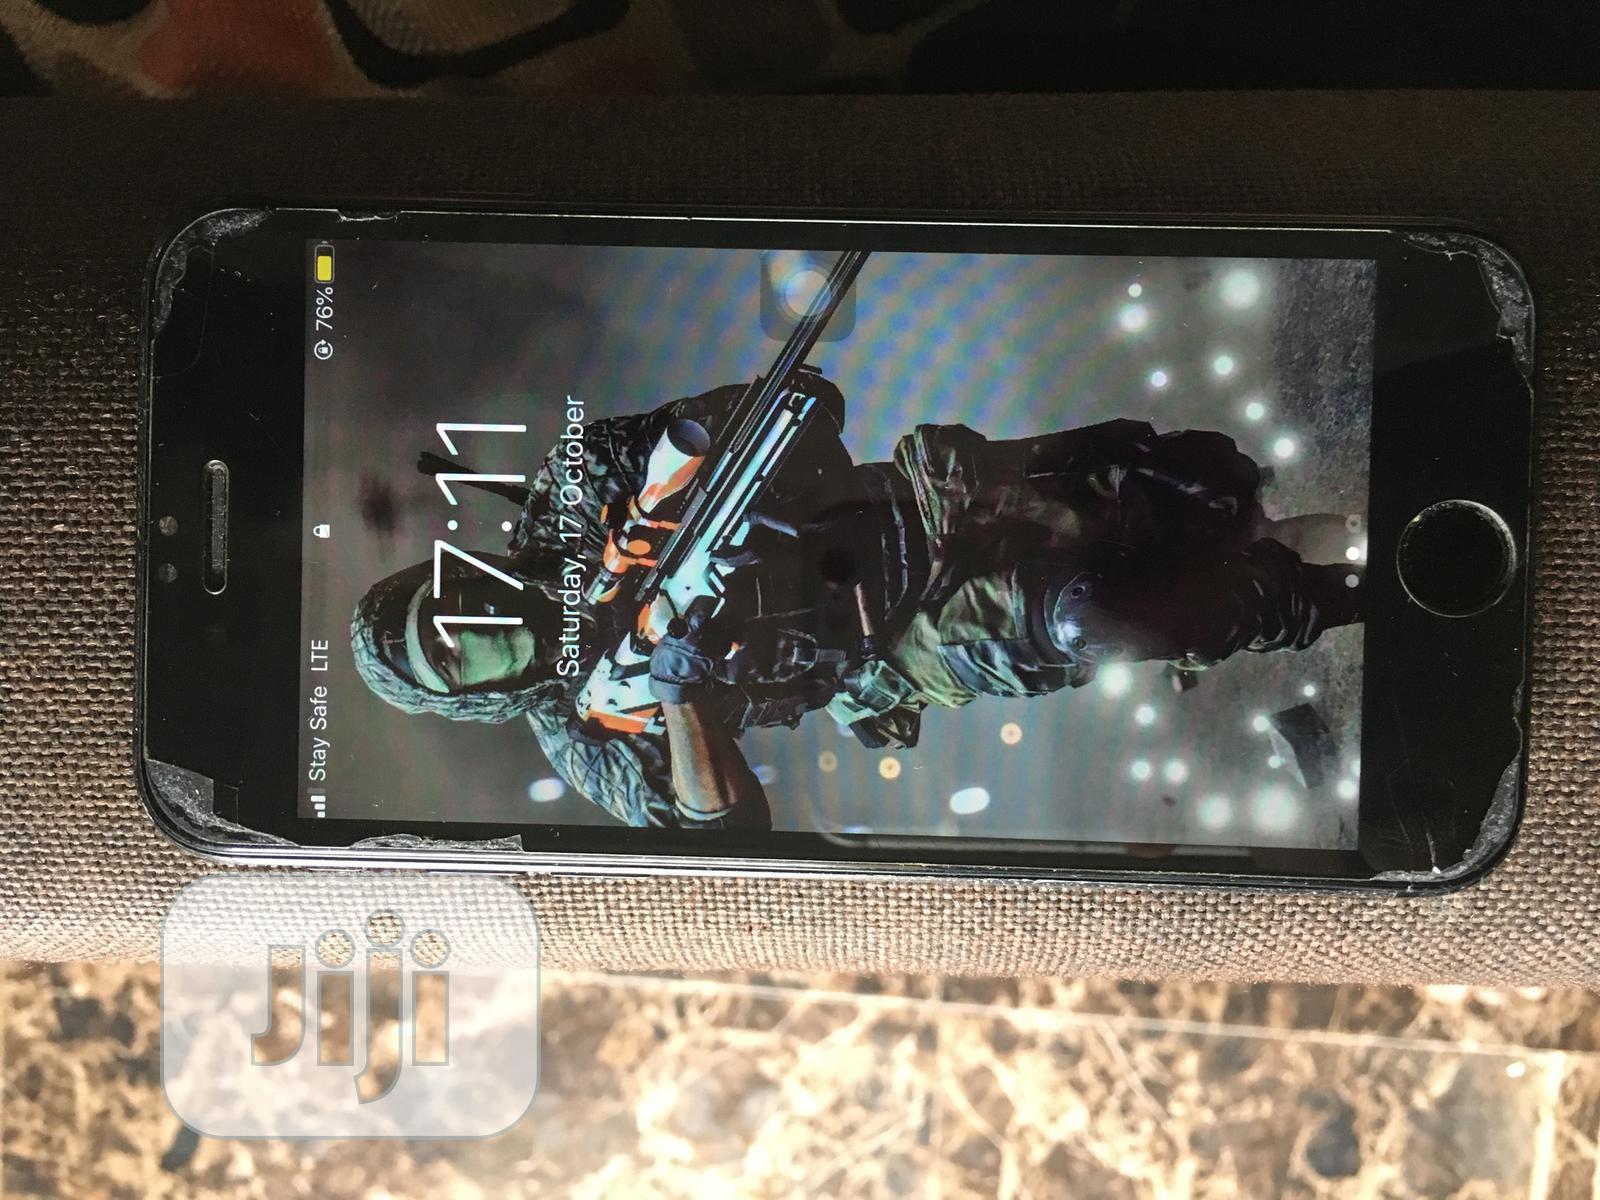 Apple iPhone 7 32 GB Black | Mobile Phones for sale in Ibadan, Oyo State, Nigeria